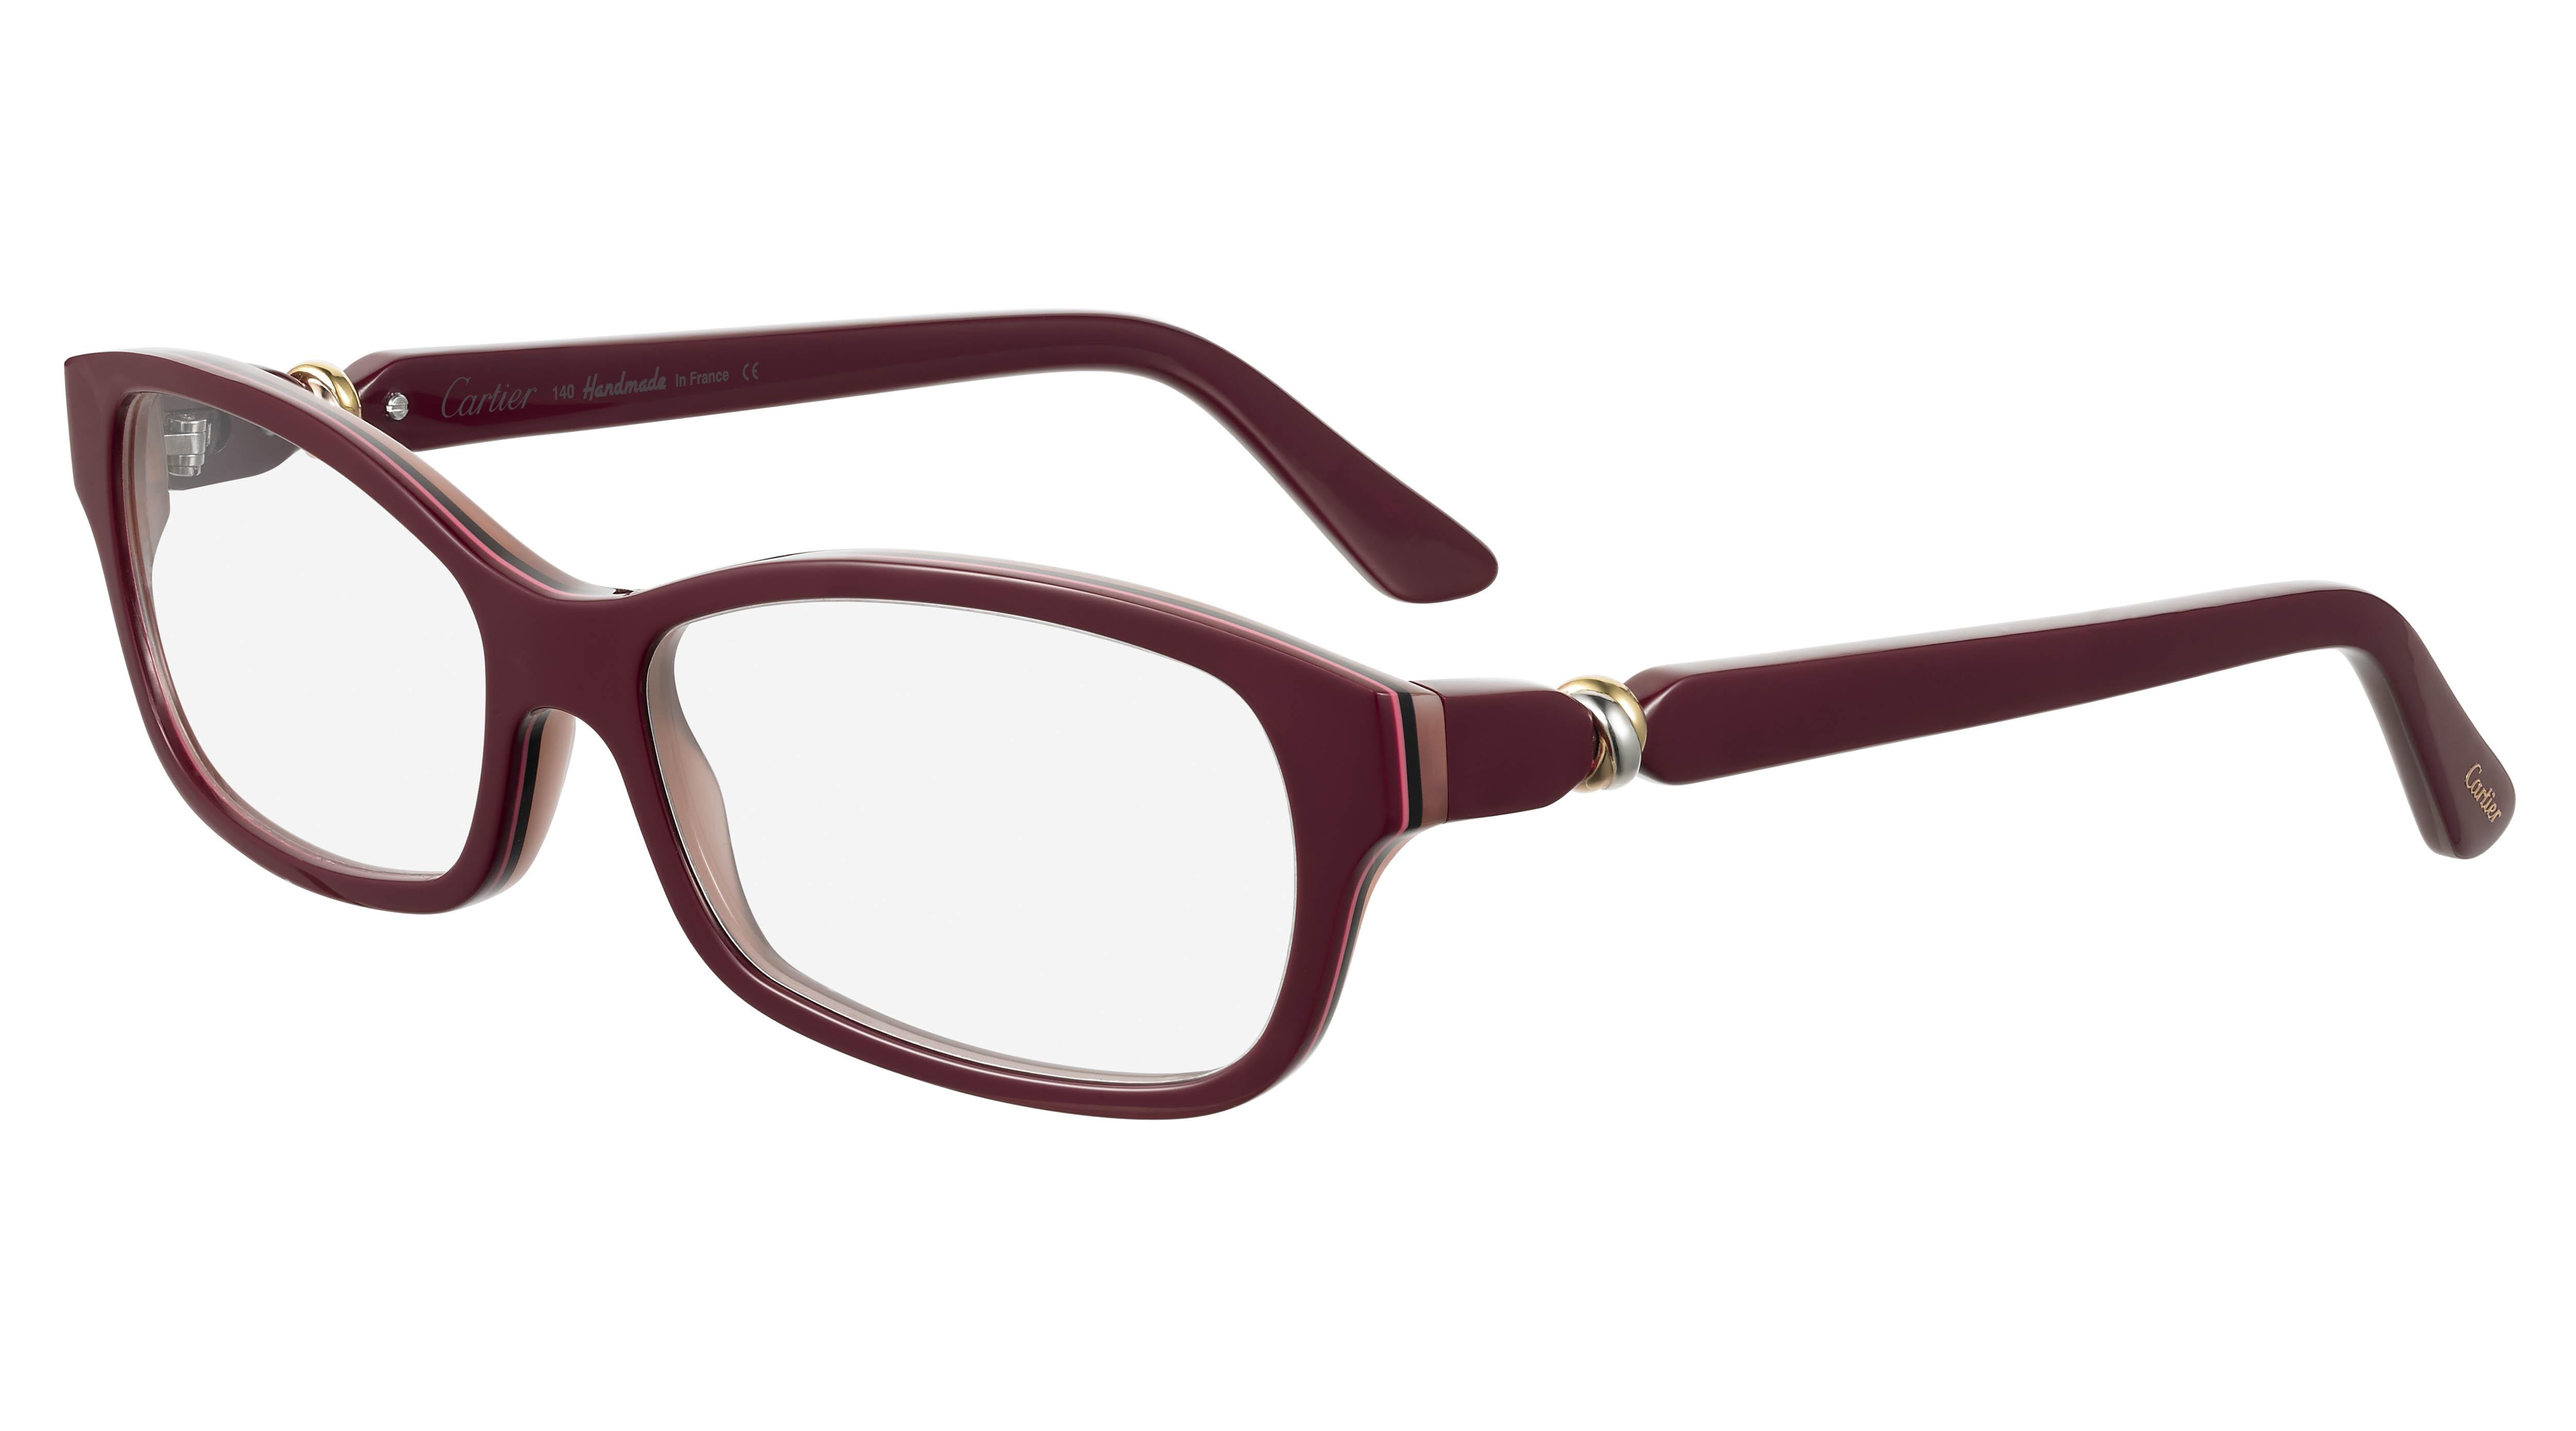 9fd0460097 Cartier Glasses